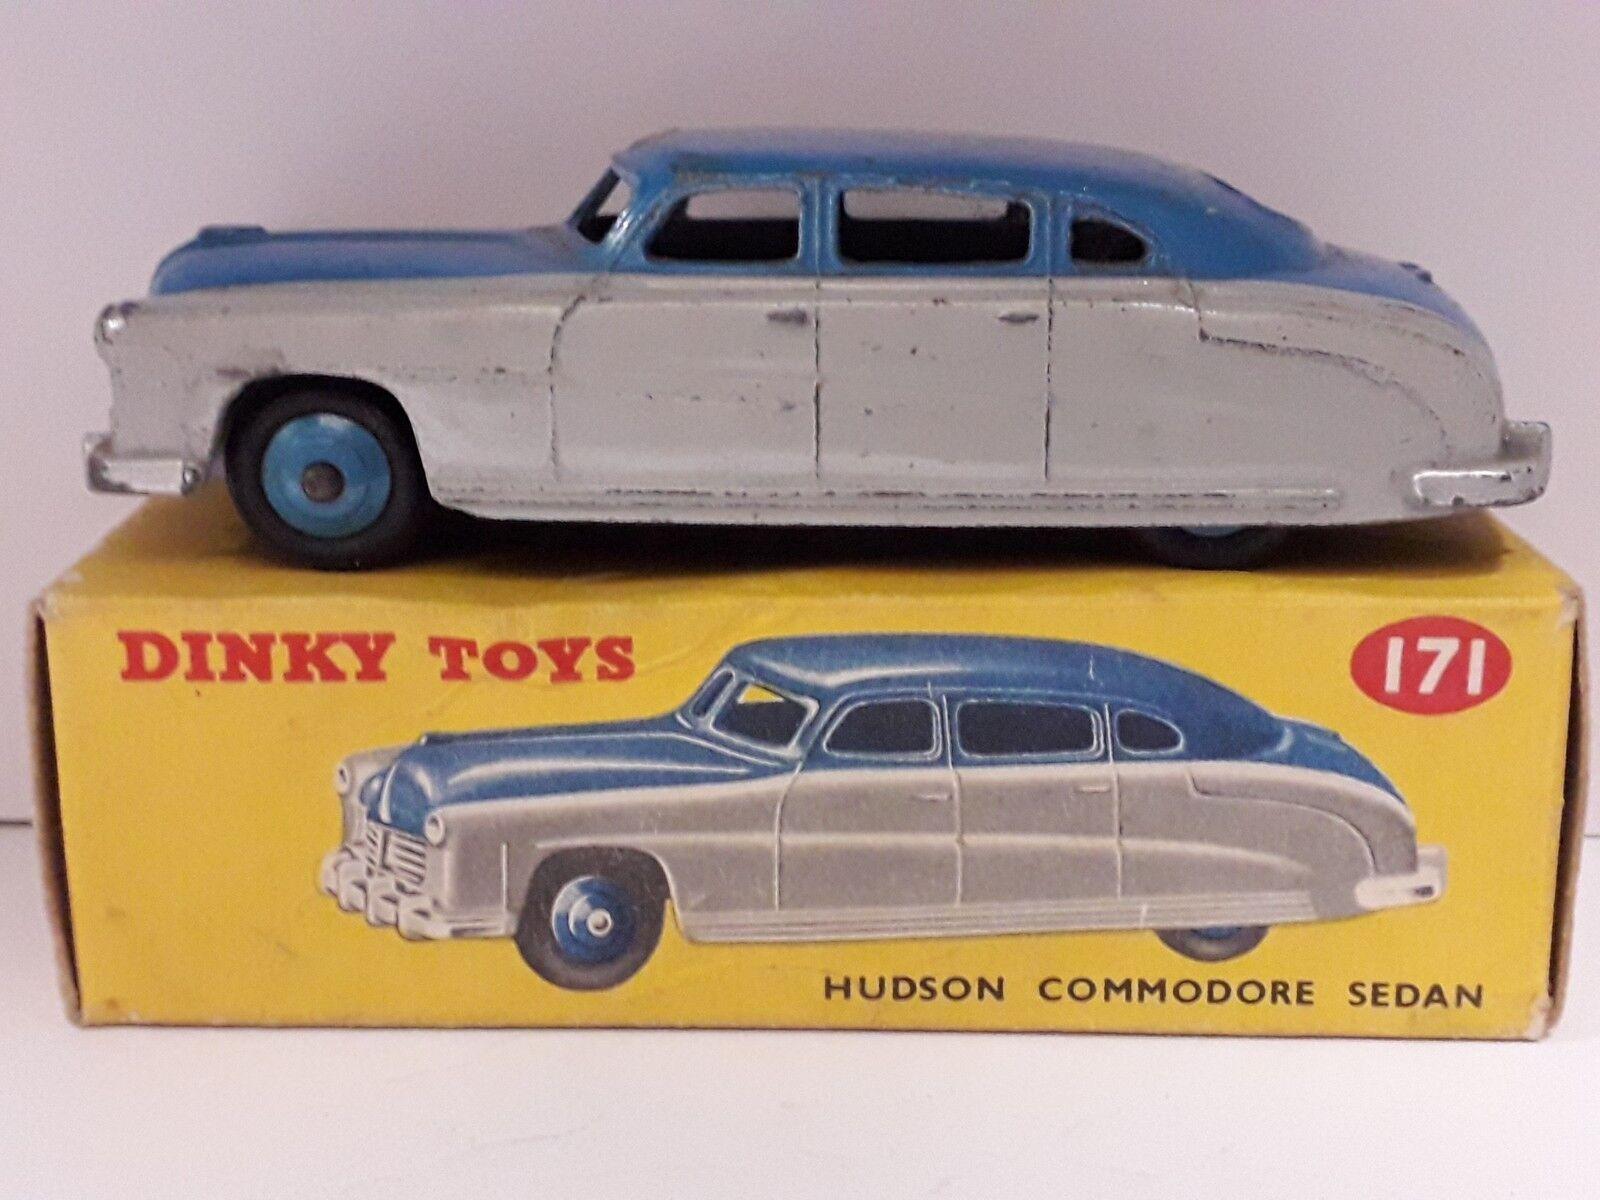 Boxed dinky spielzeug 171 hudson commodore limousine hellgraue lower body & Blau.